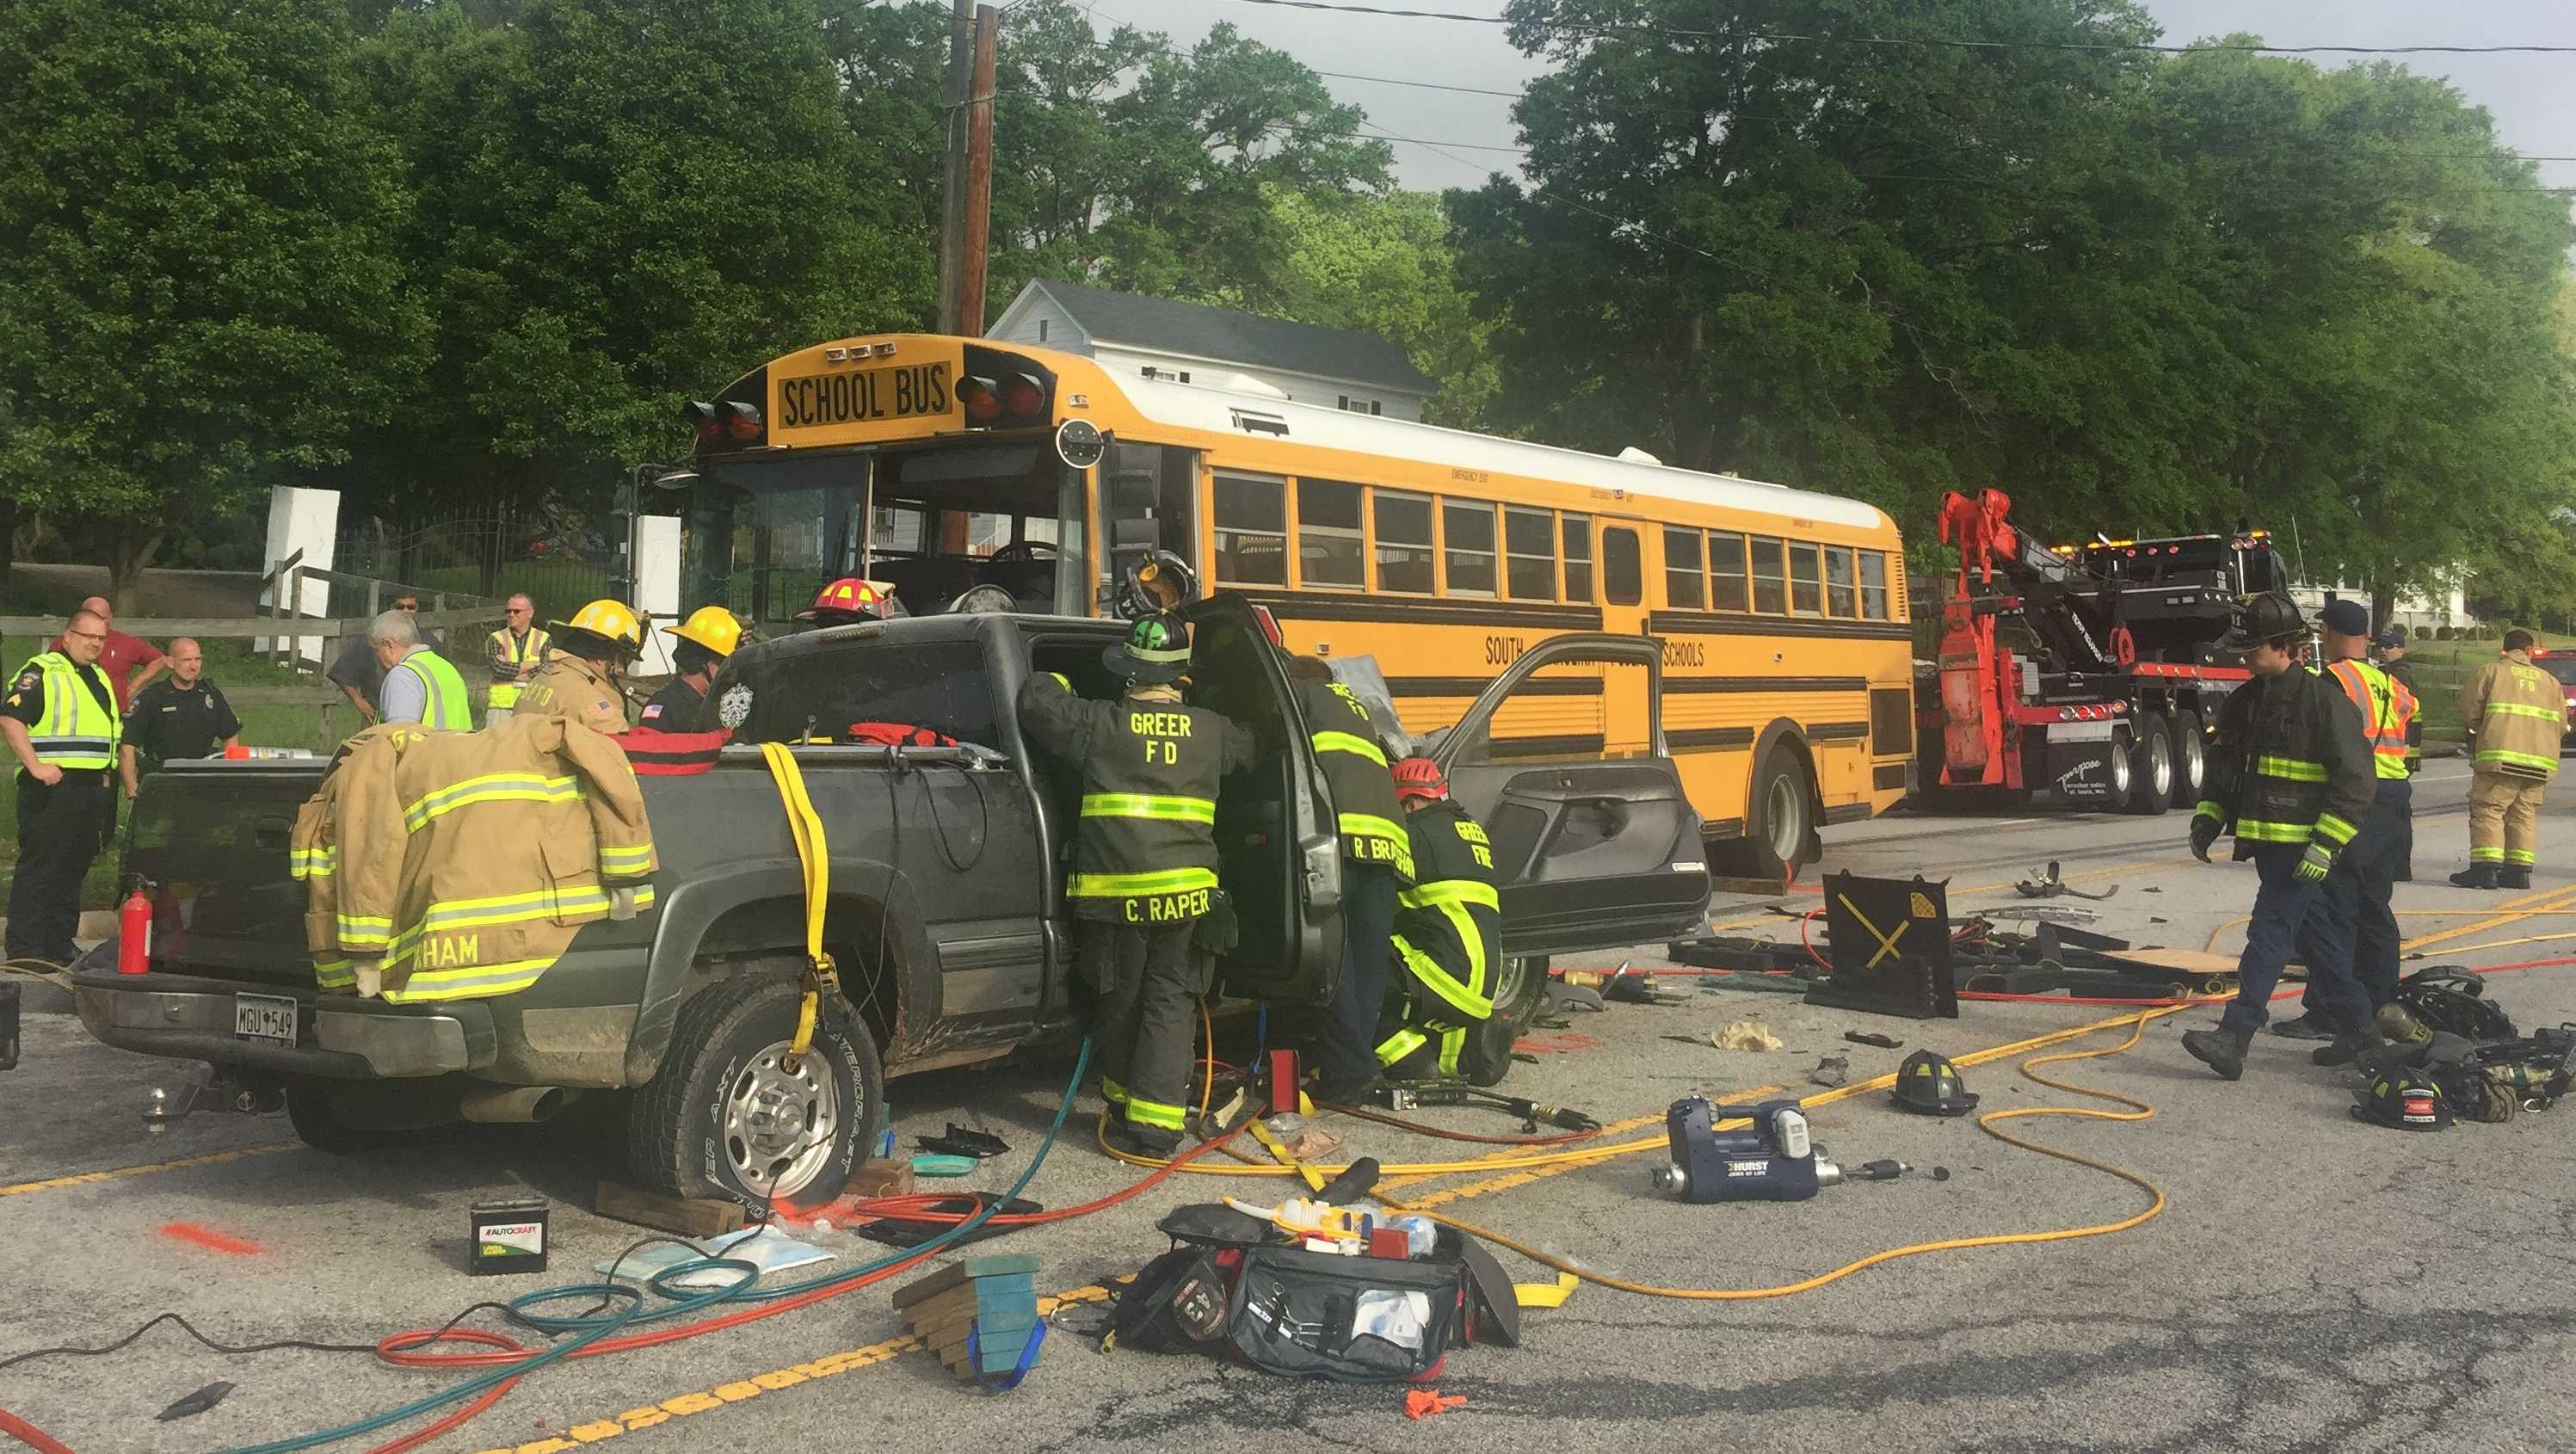 School bus fire crash